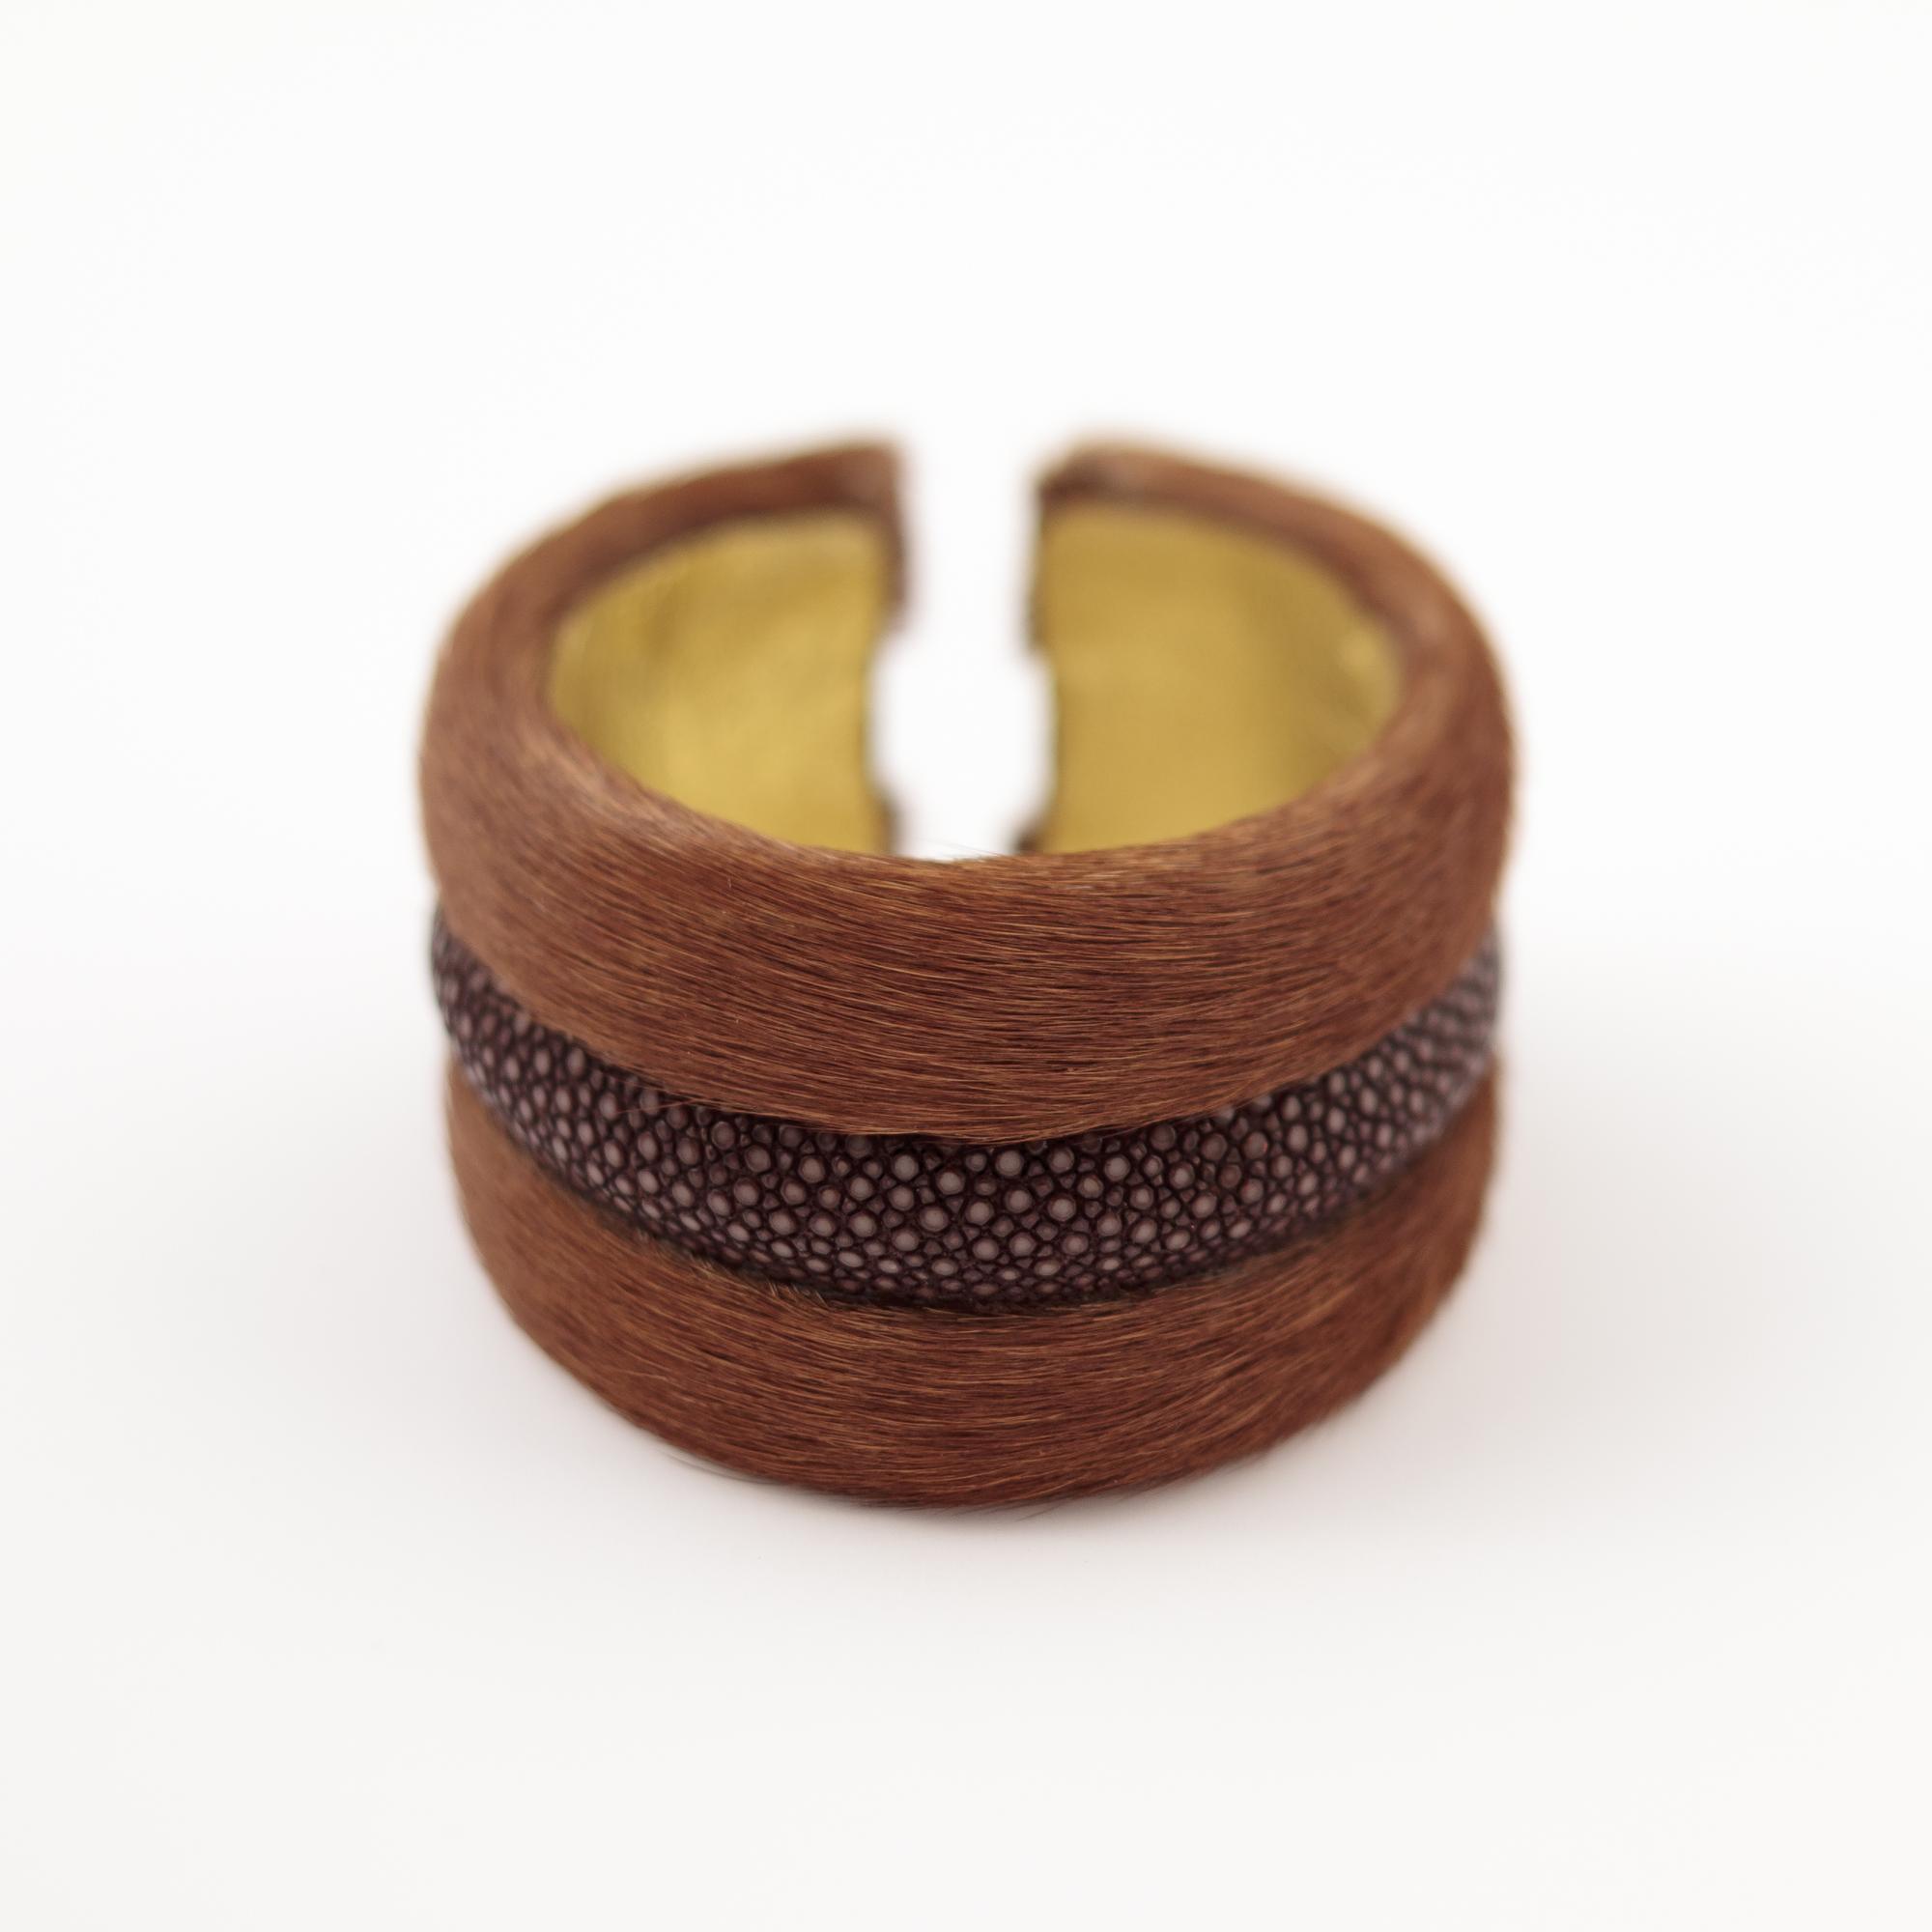 tresor-by-flore-galuchat-bracelet-poilu-marron-chocolat